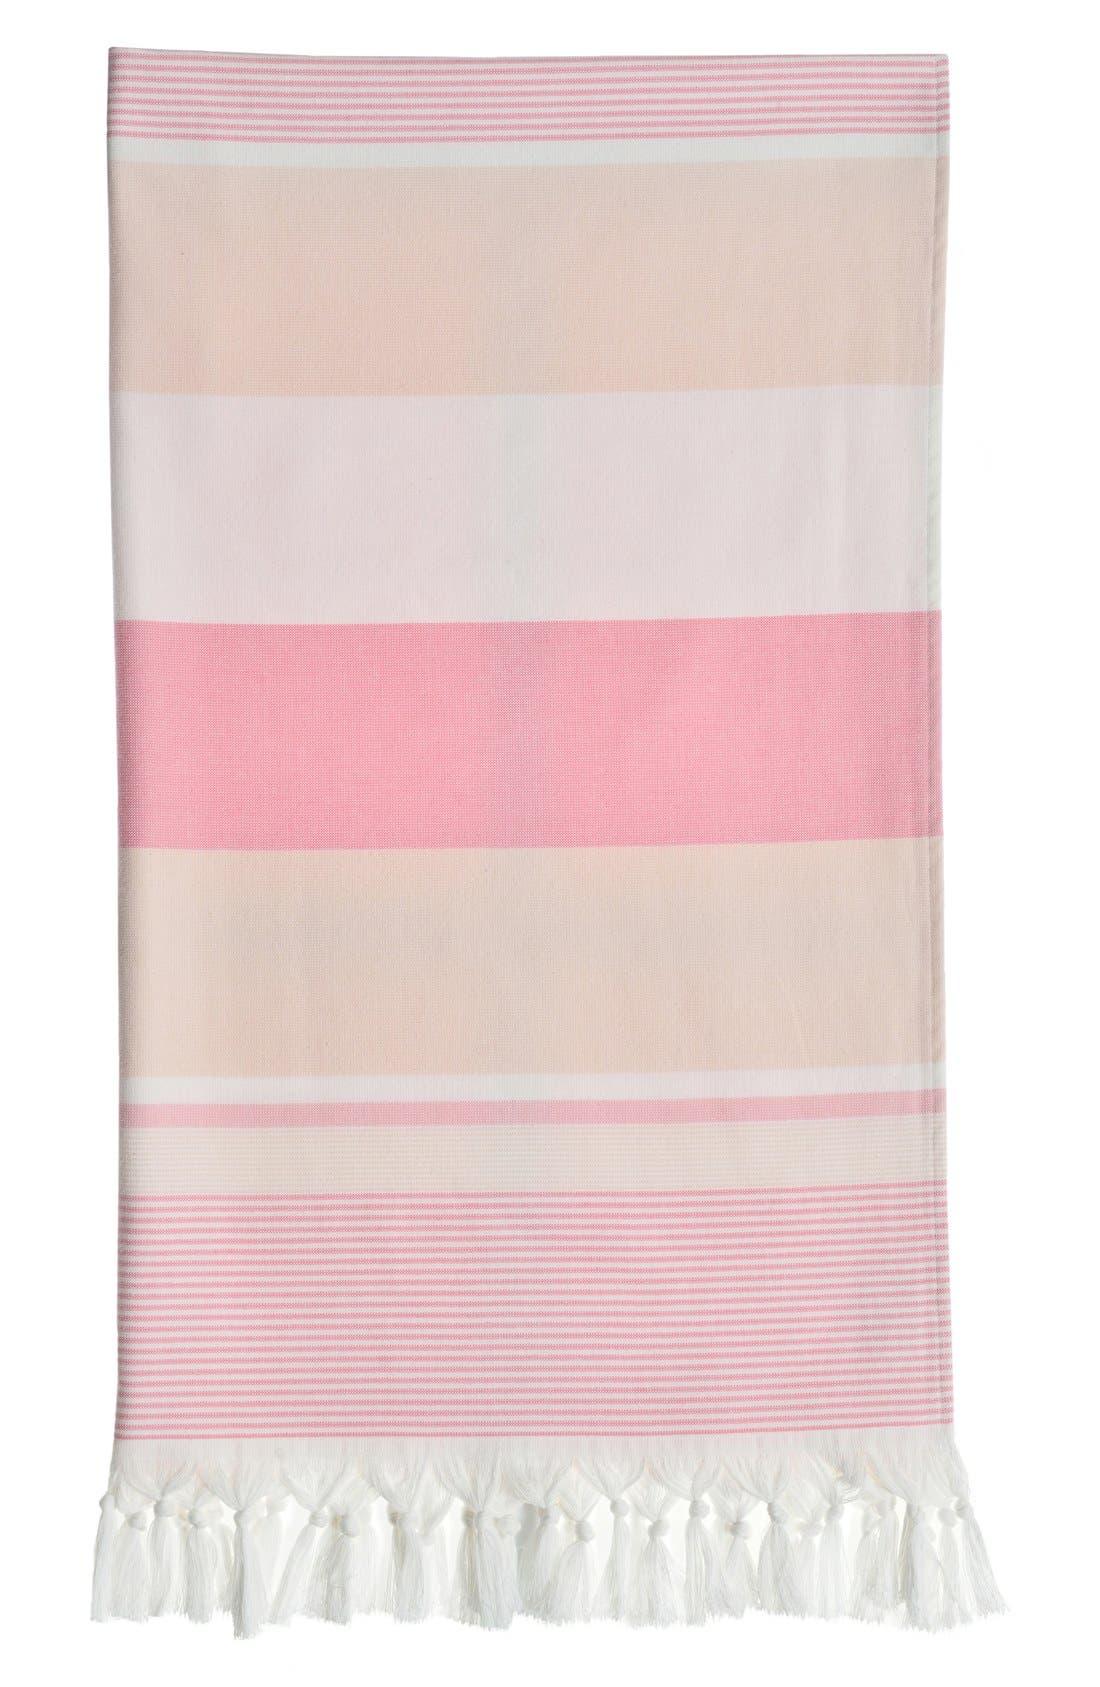 'Summer Loving' Turkish Pestemal Towel,                             Alternate thumbnail 6, color,                             650